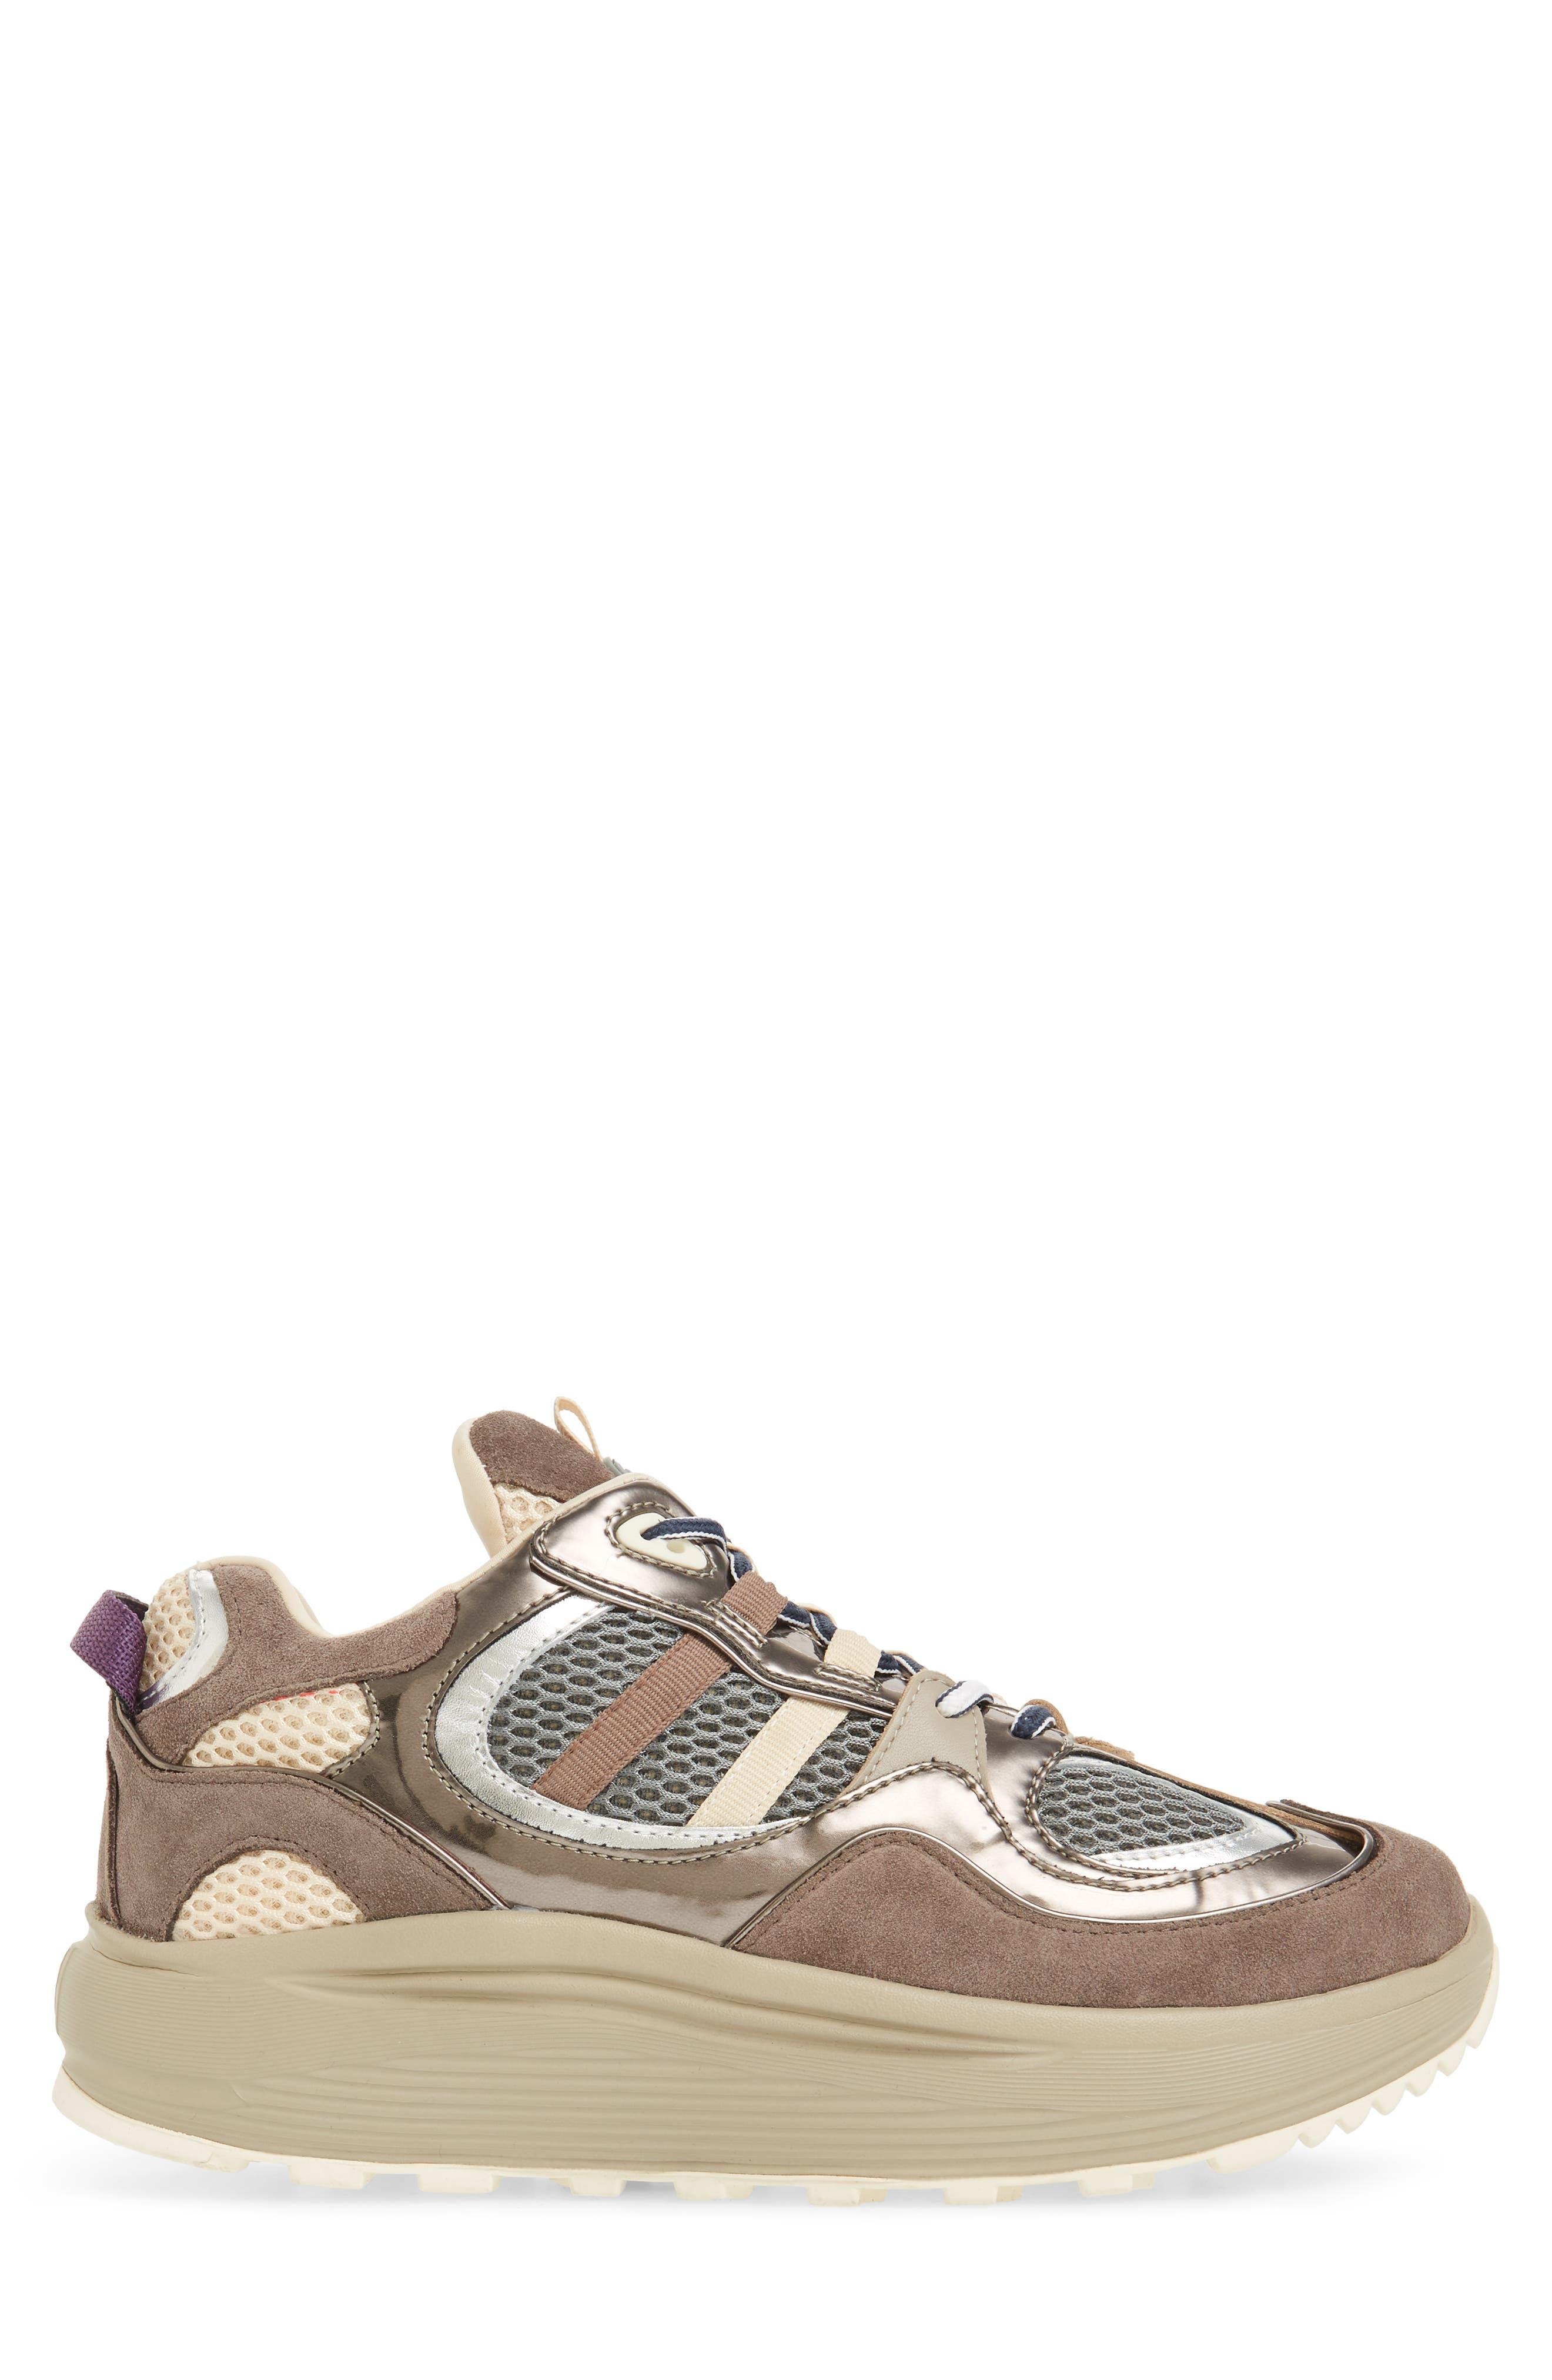 Jet Turbo Flatform Sneaker,                             Alternate thumbnail 3, color,                             060